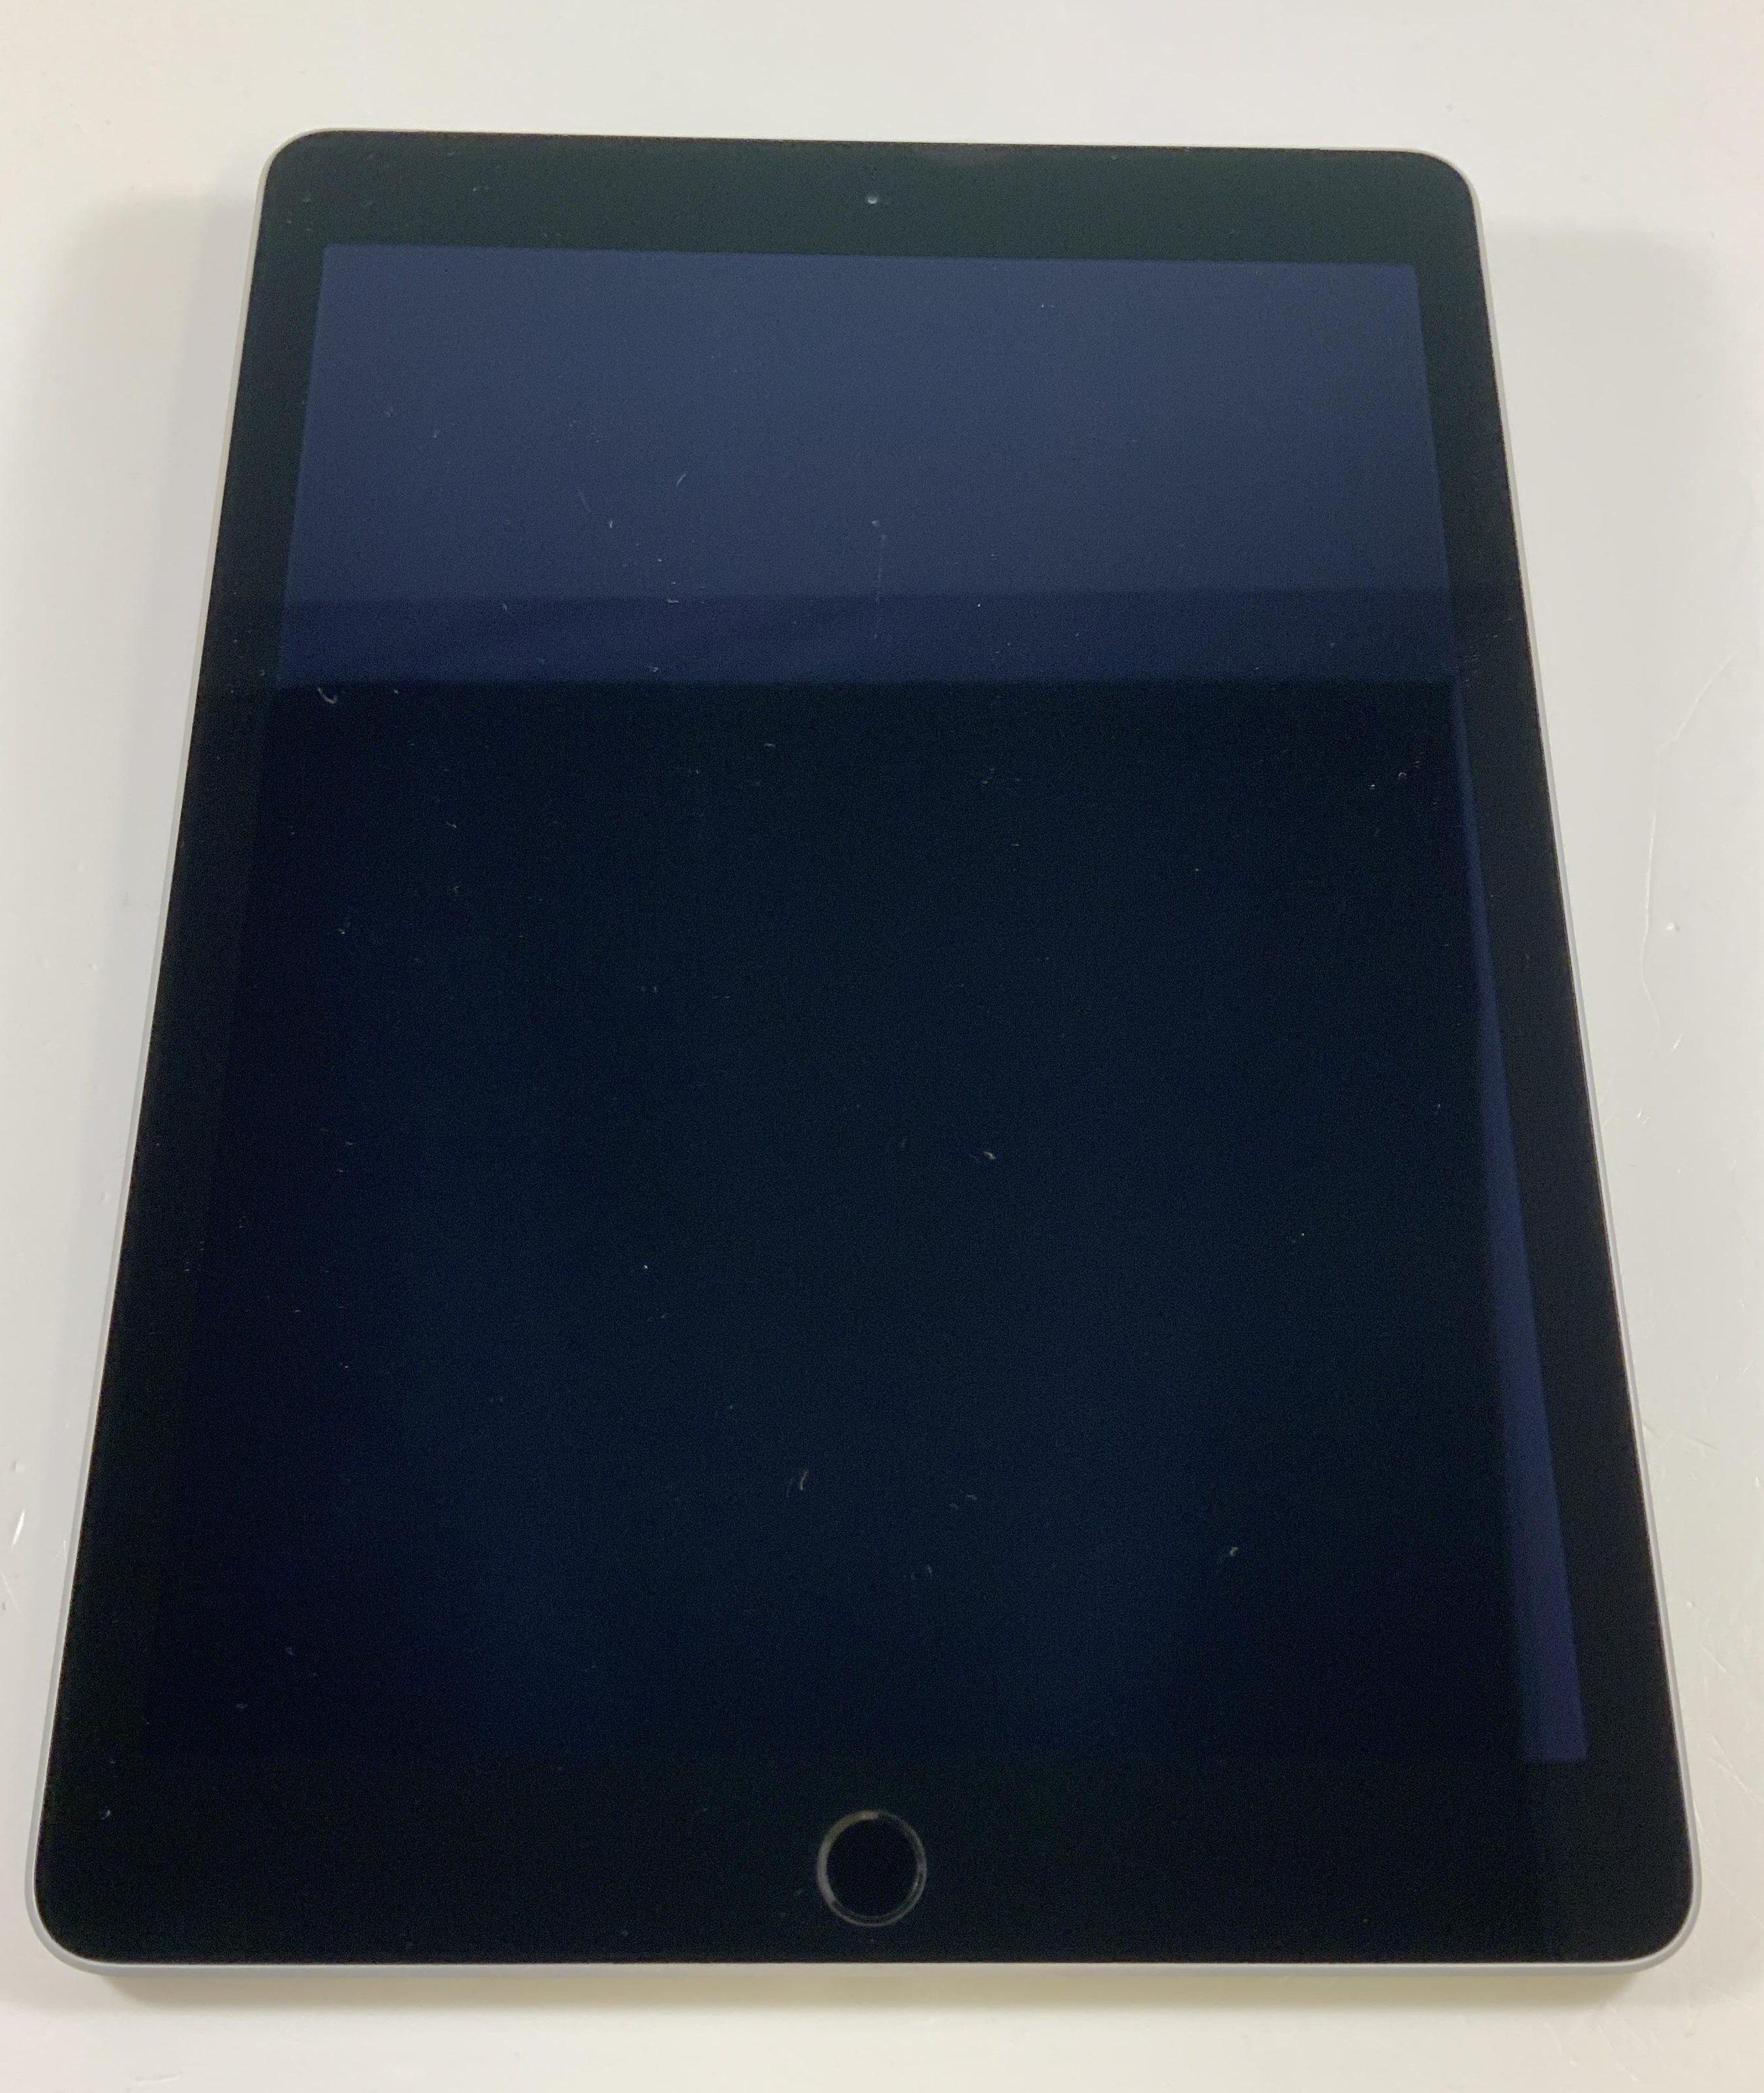 iPad Air 2 Wi-Fi + Cellular 64GB, 64GB, Space Gray, imagen 1